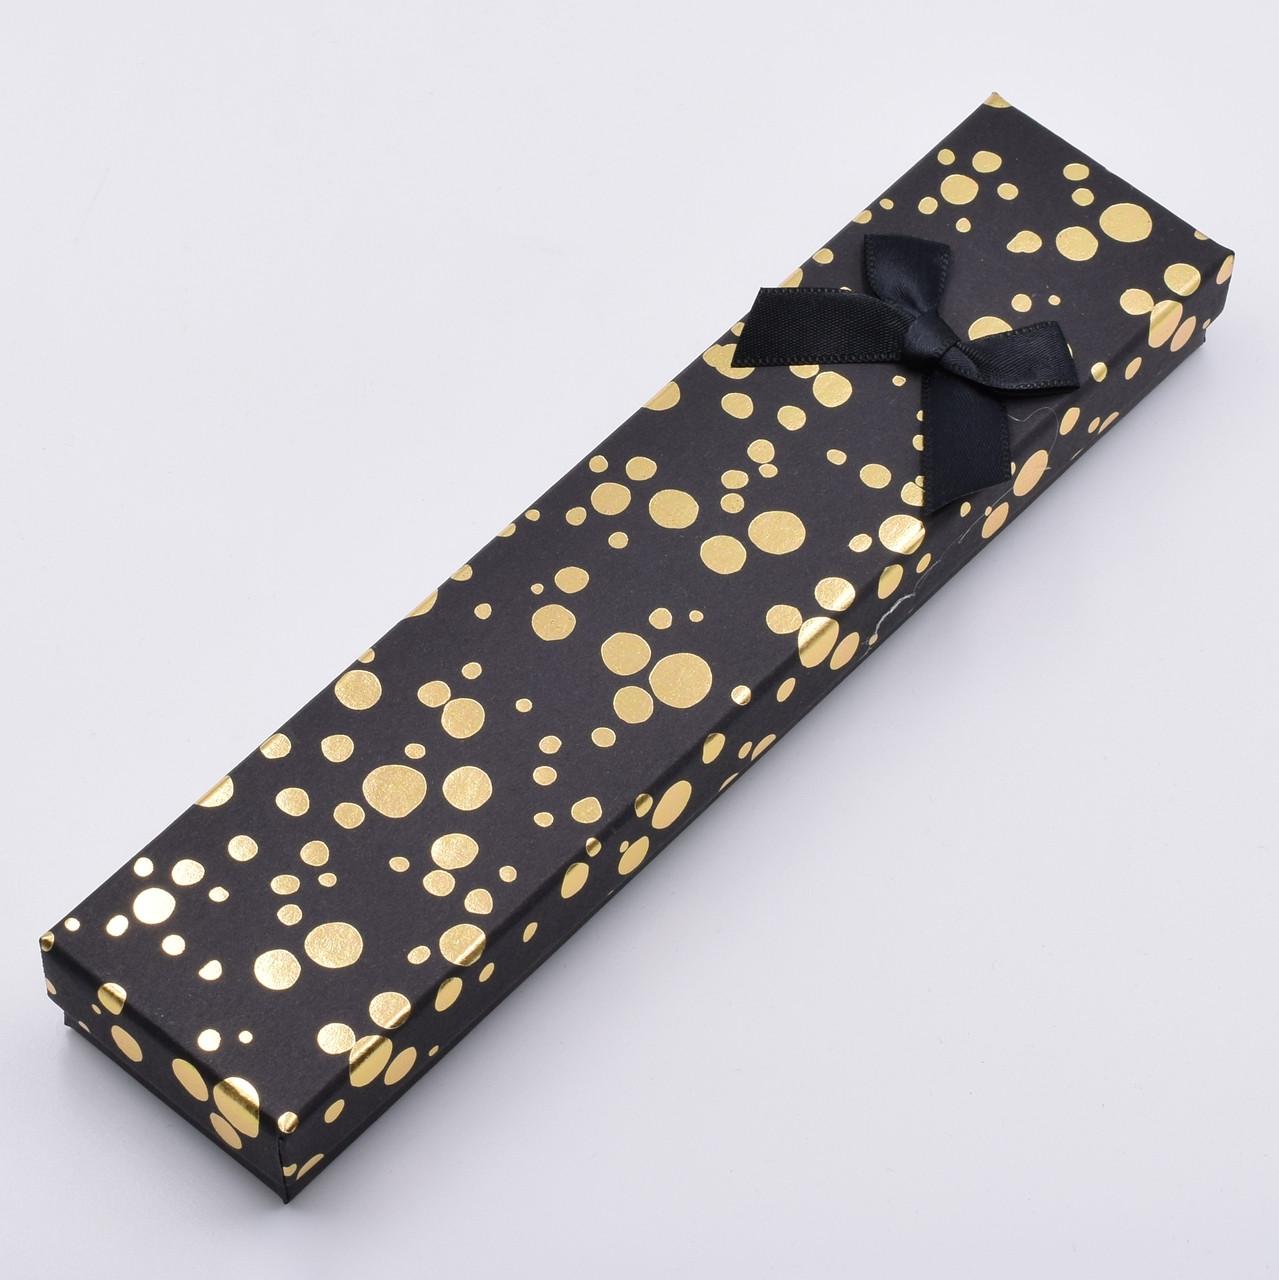 Футляр черный 741181 для цепочек браслетов размер 21х4 см